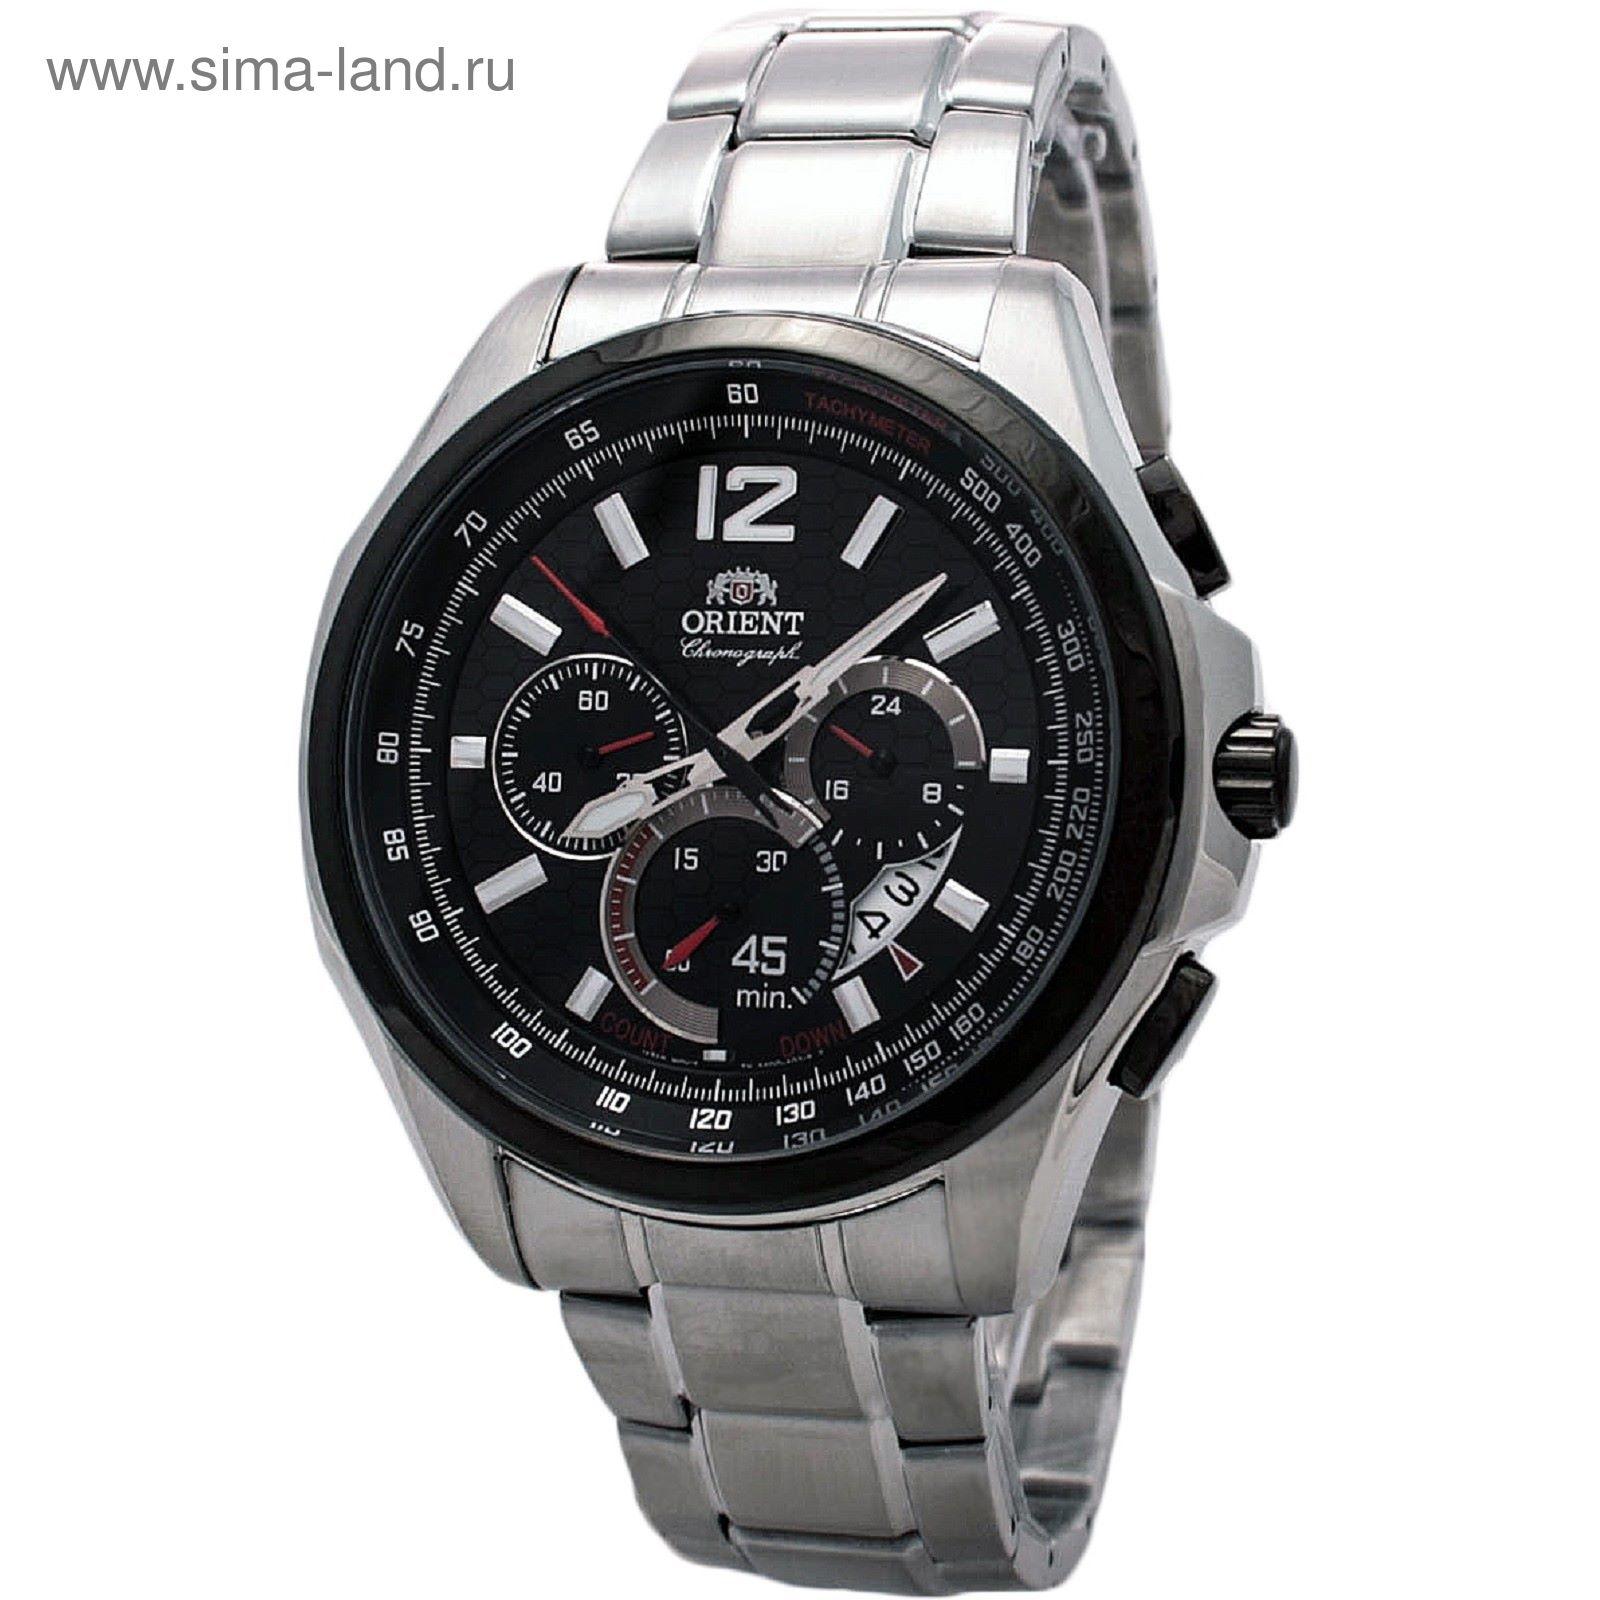 Часы наручные мужские Orient FSY00001B (1607206) - Купить по цене от ... aab7c60bc349b